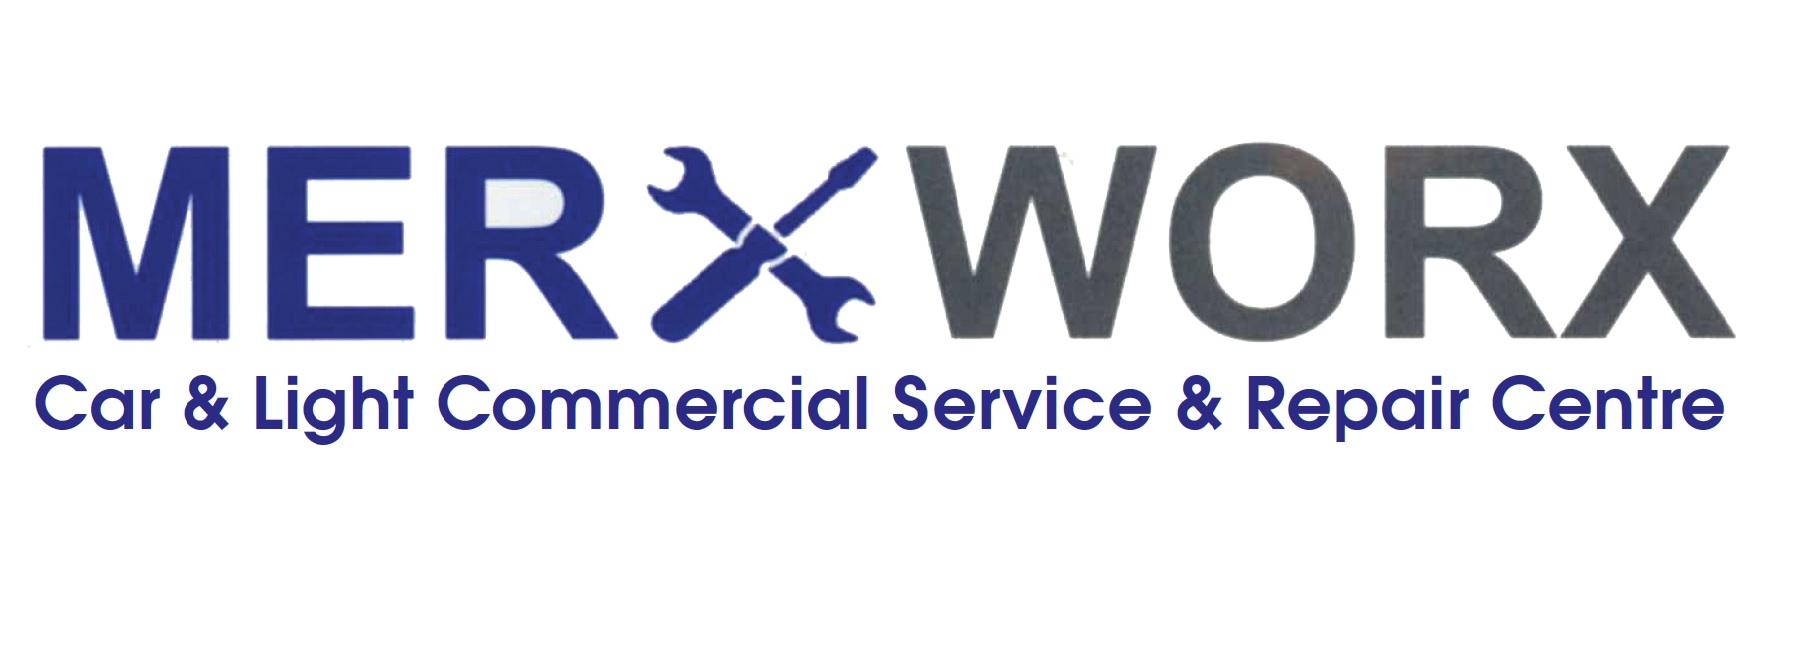 Merxworx